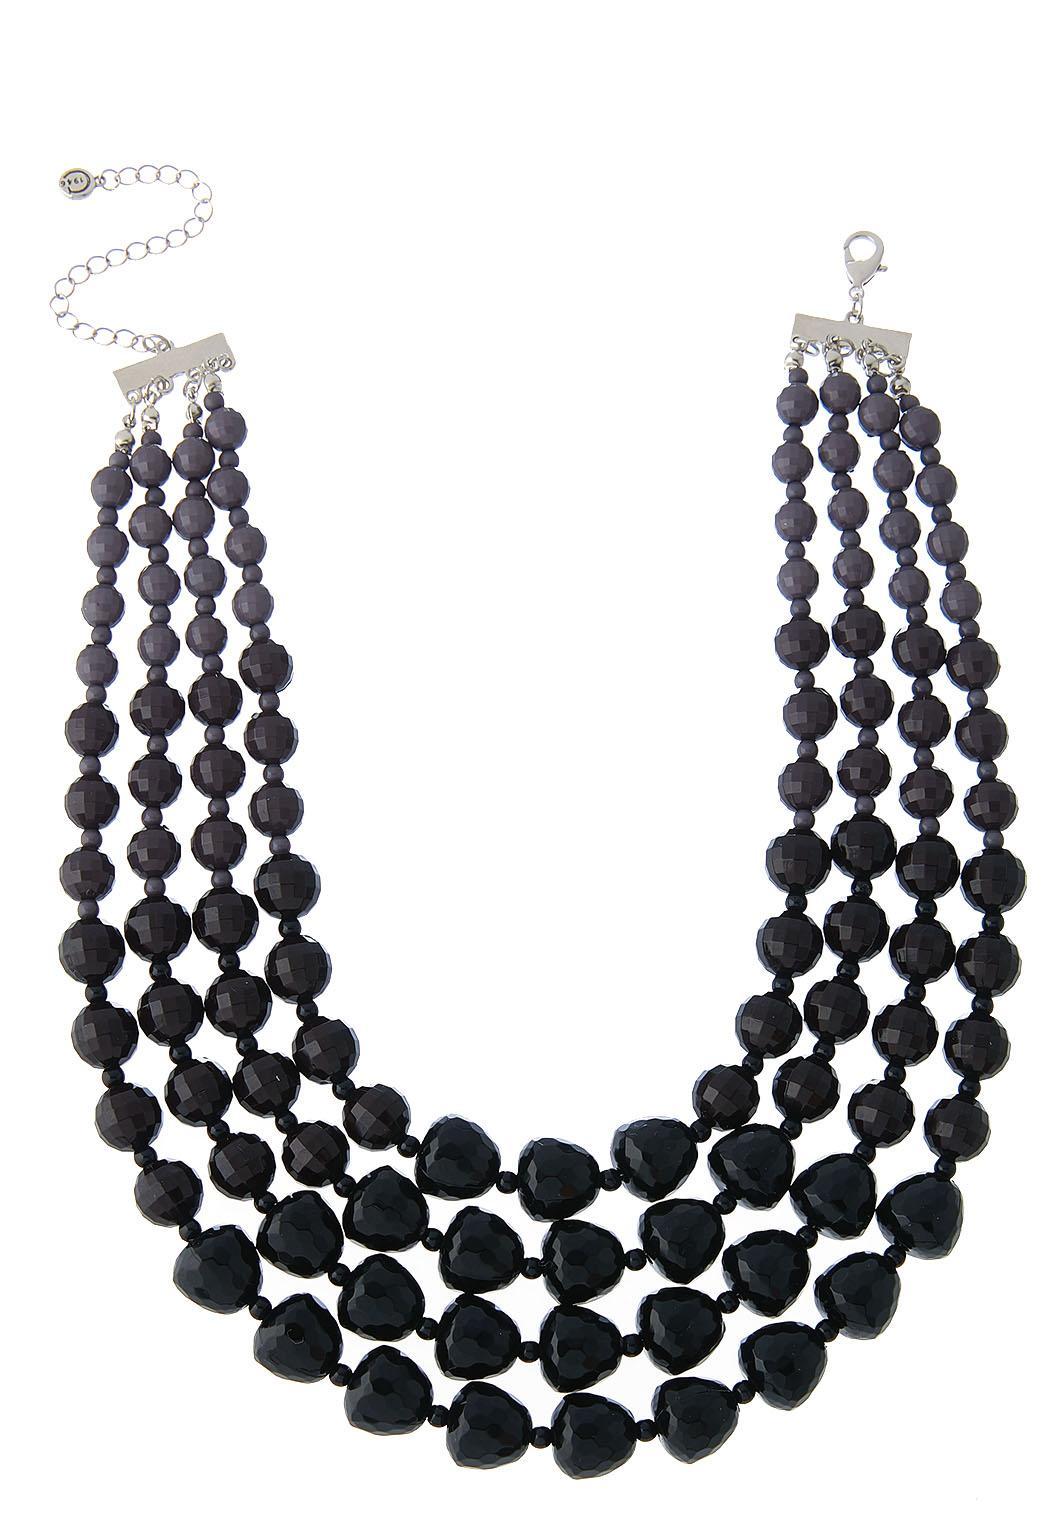 Beaded Multi Row Necklace